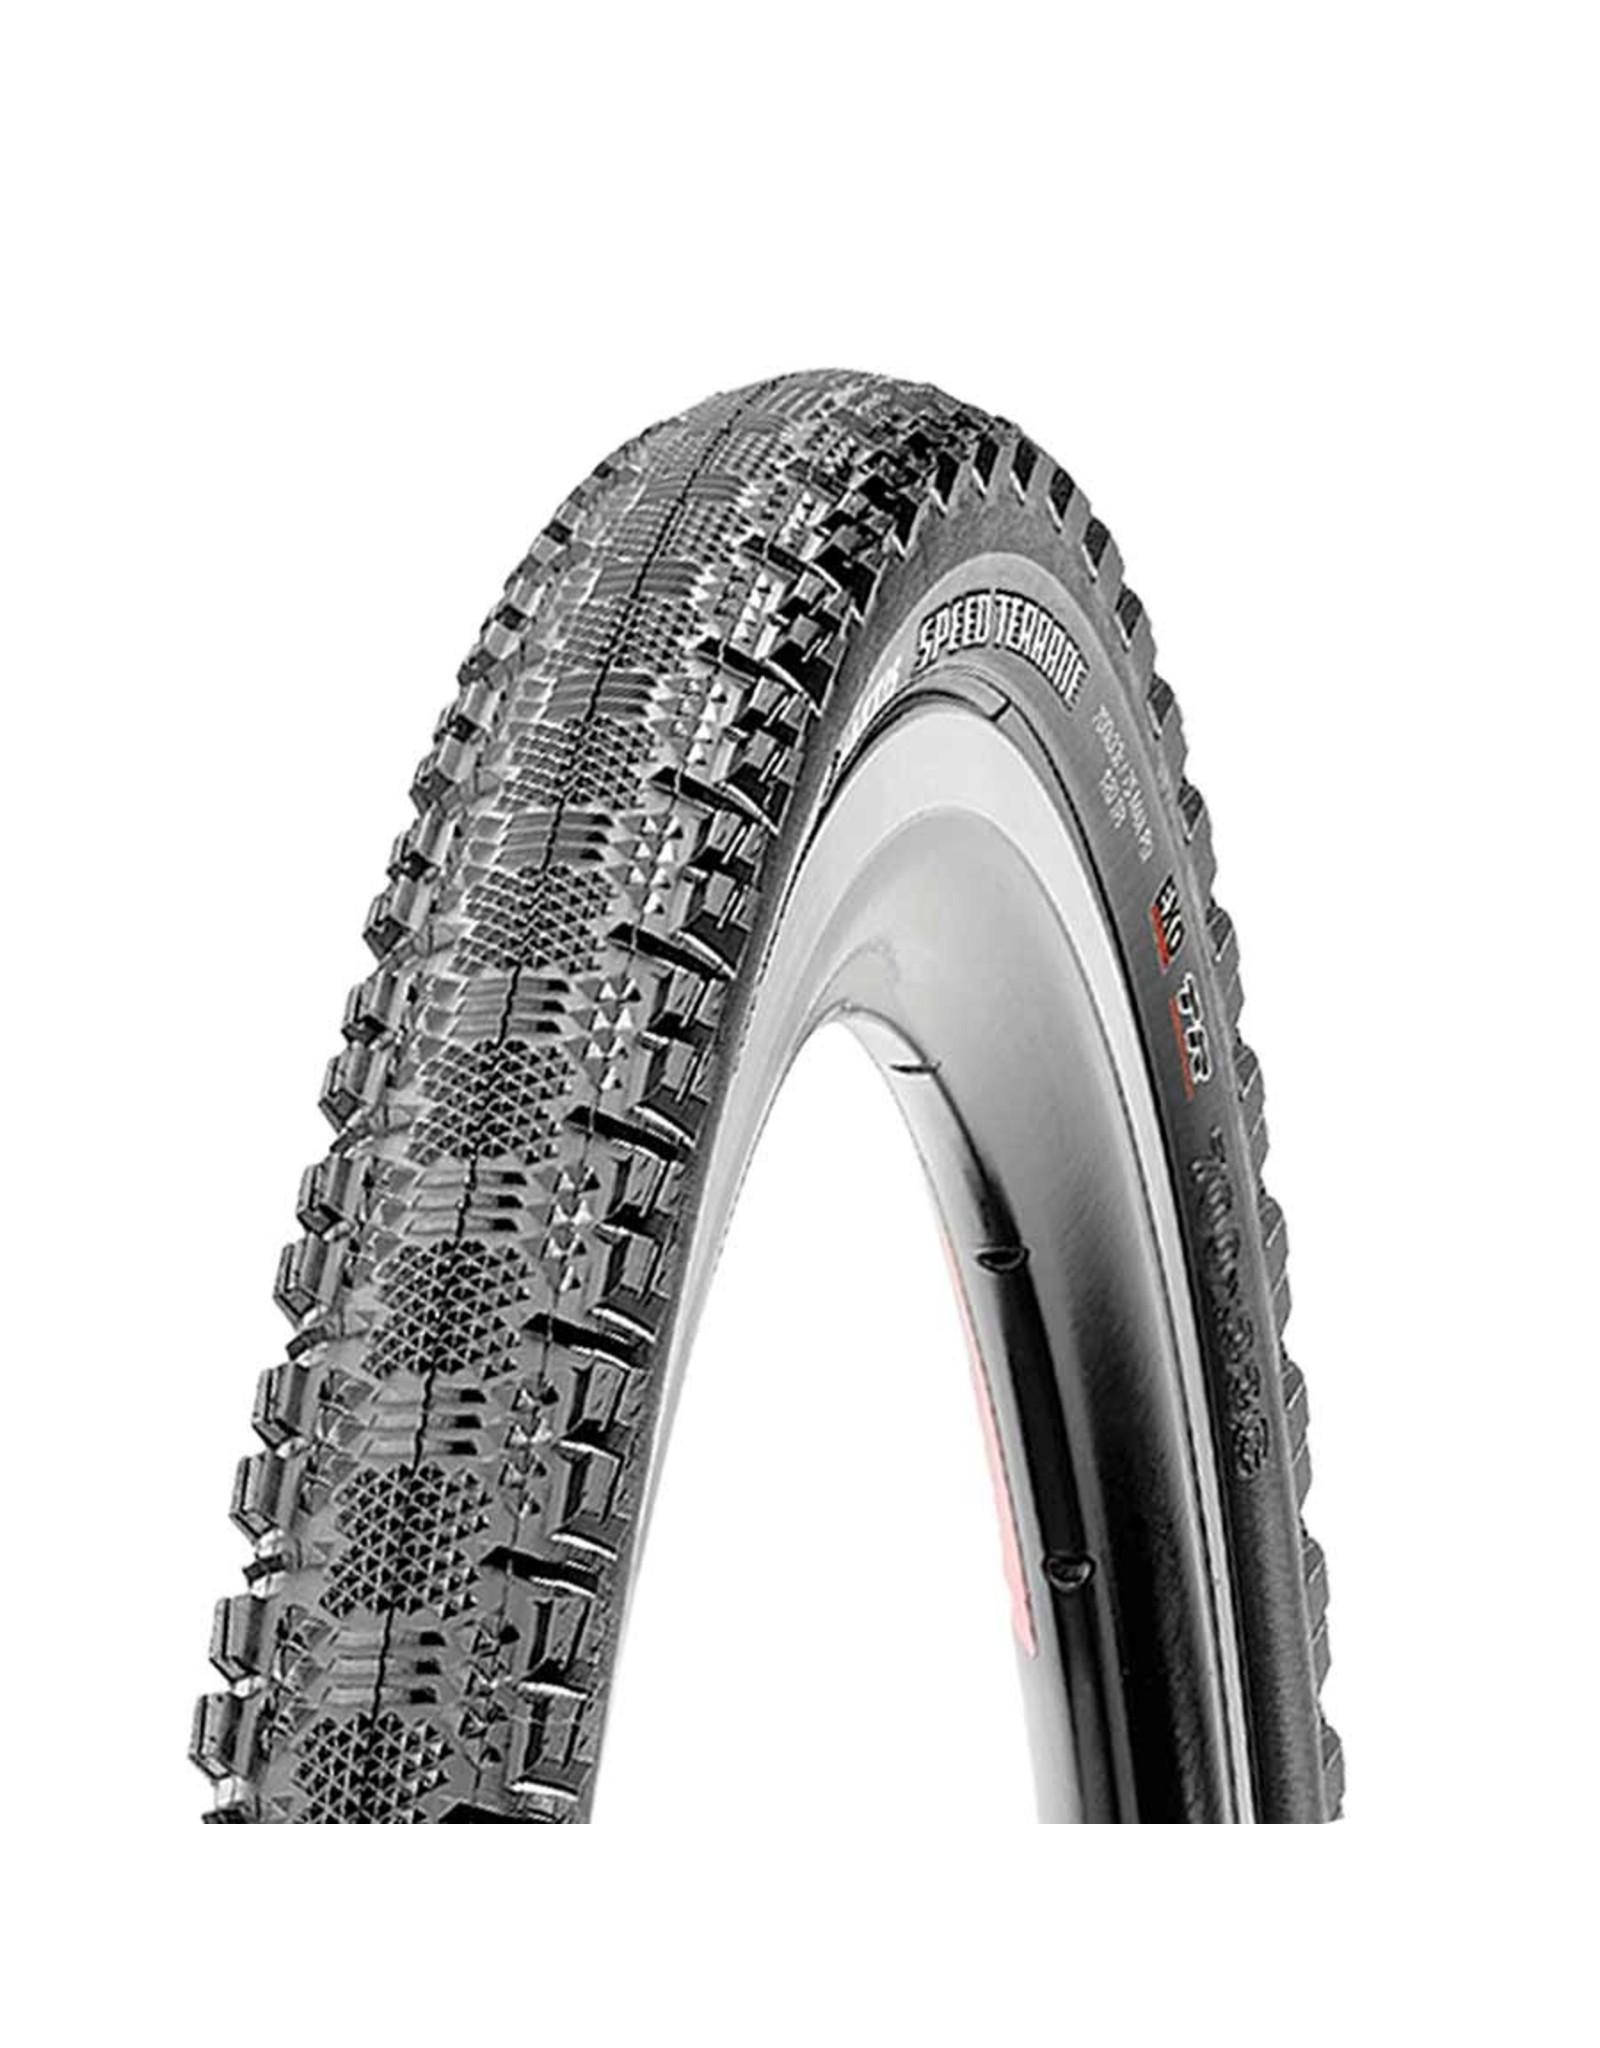 Maxxis Maxxis, Speed Terrane, Tire, 700x33C, Folding, Tubeless Ready, Dual, EXO, 120TPI, Black